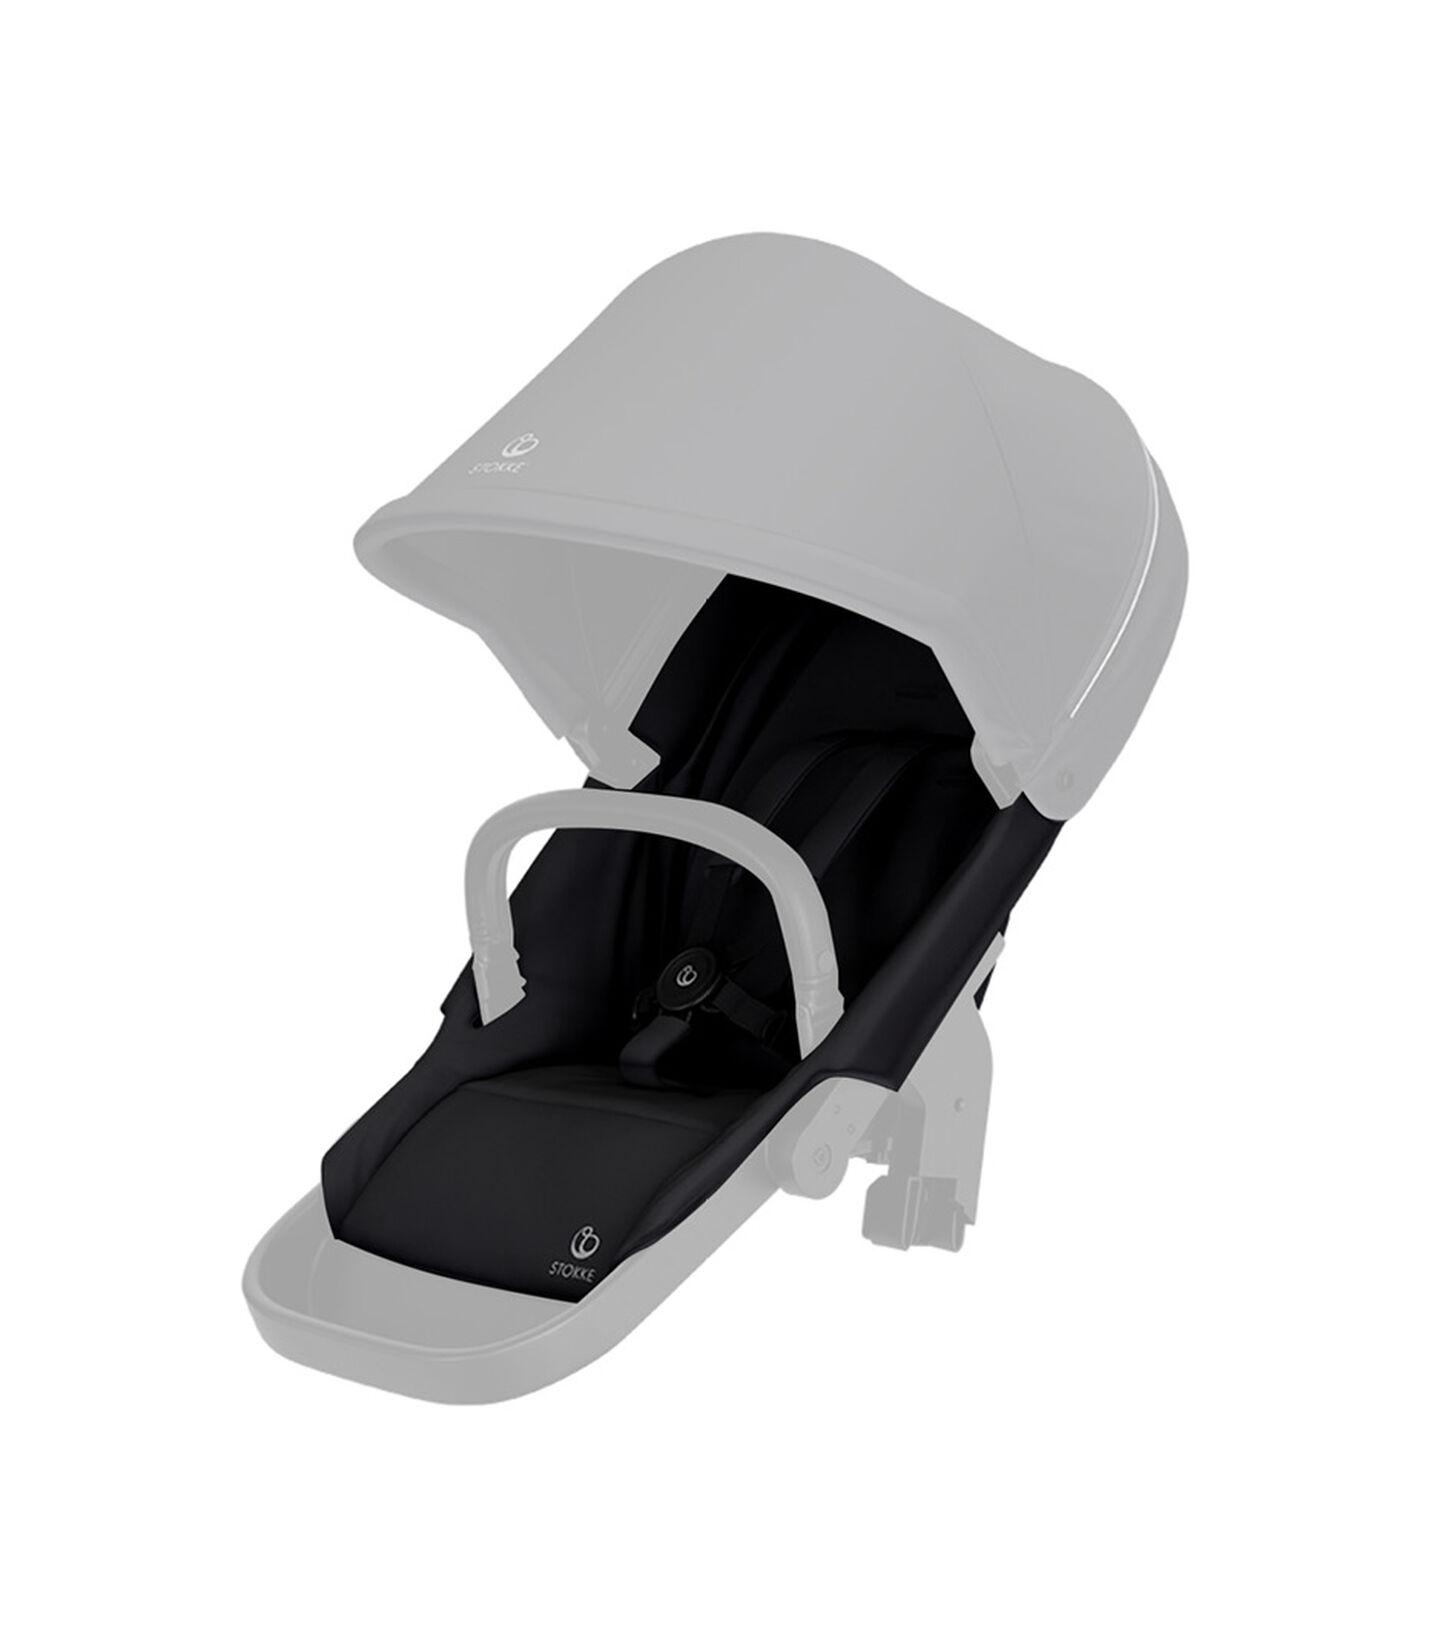 Stokke® Beat seat textile BlackMel wo Can Harness Shpg Baske, Negro Melange, mainview view 2